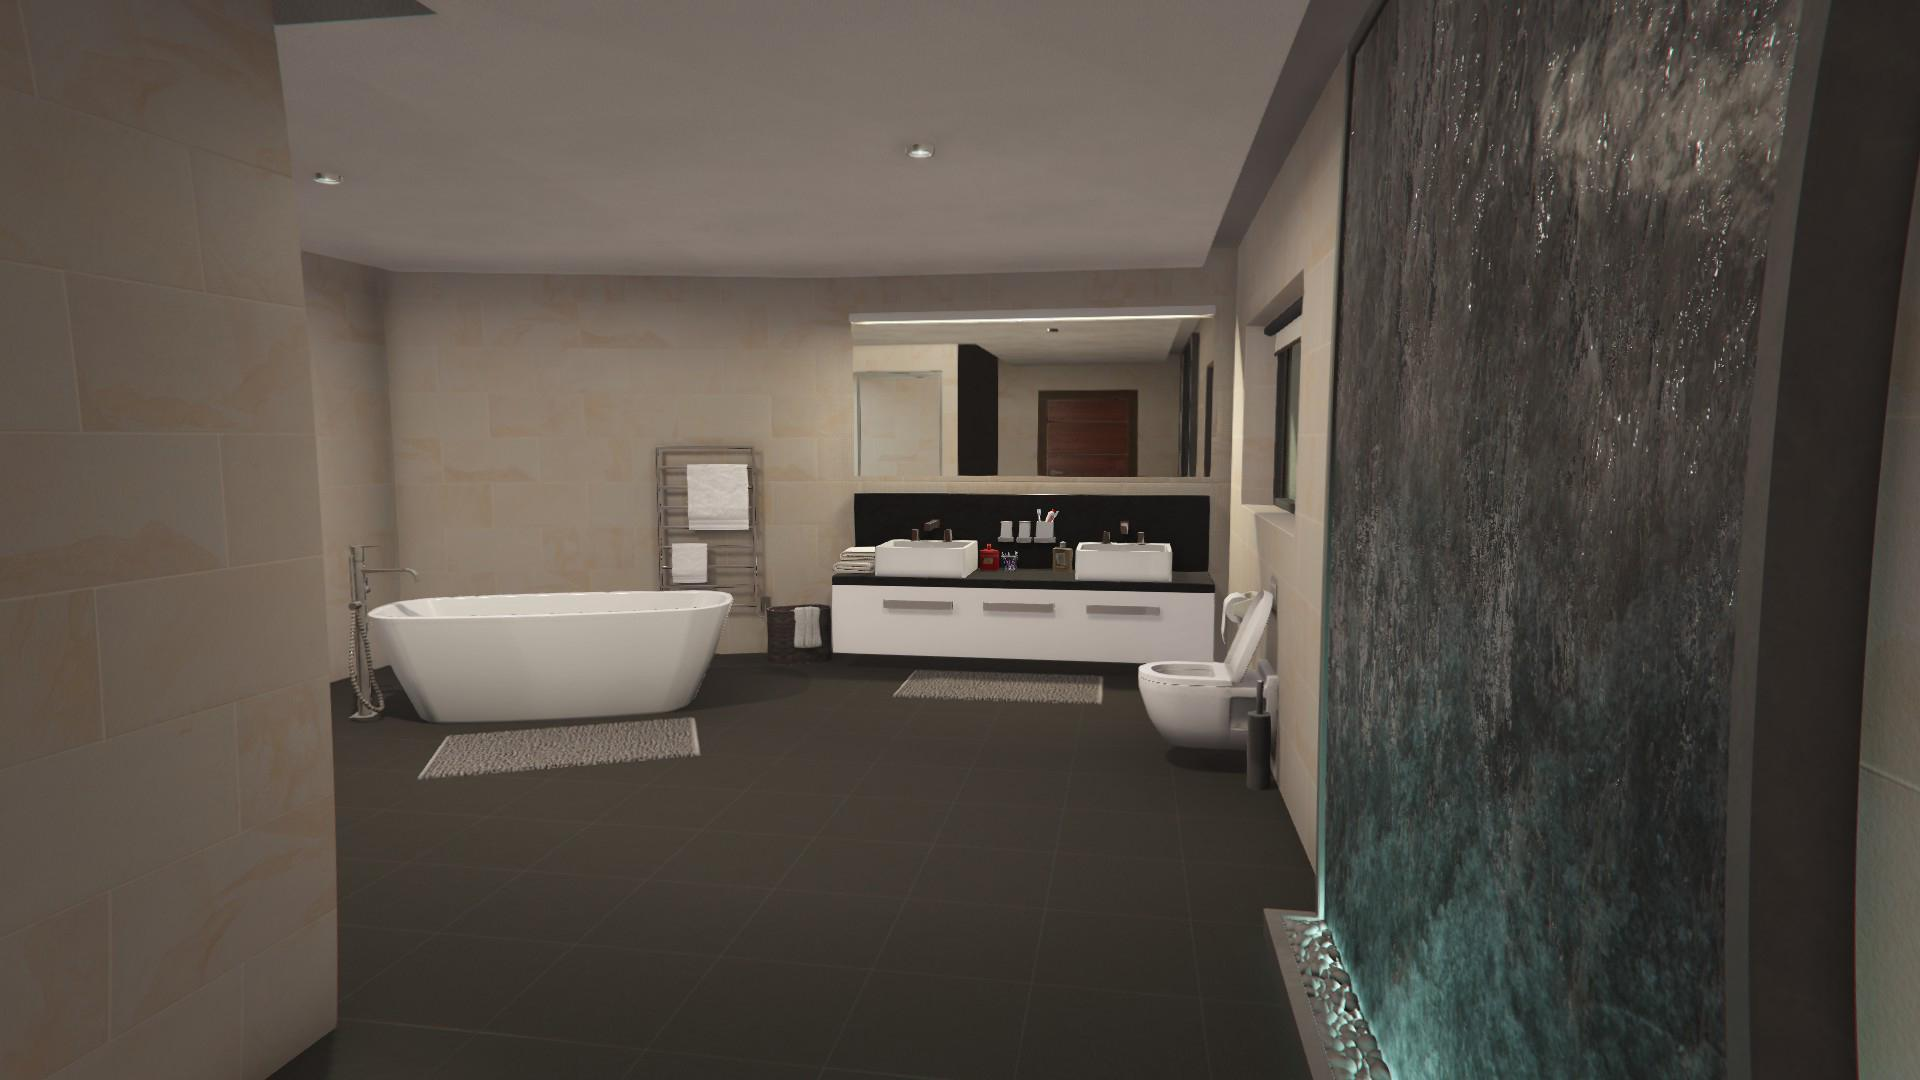 Apartment Stilthouse 09 Bathroom Waterfall